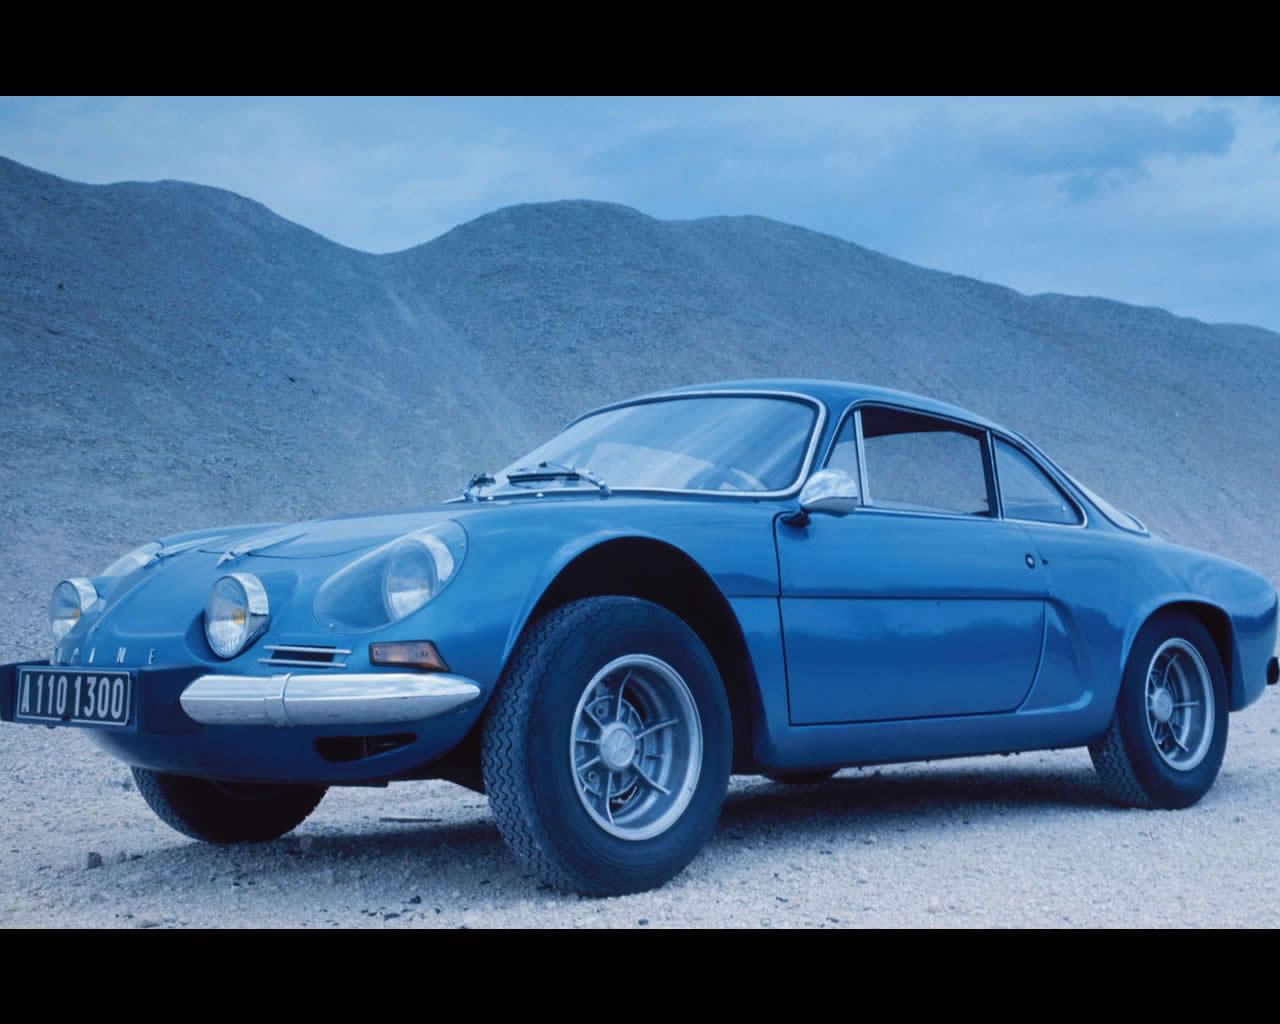 1962 renault alpine a110 - photo #3